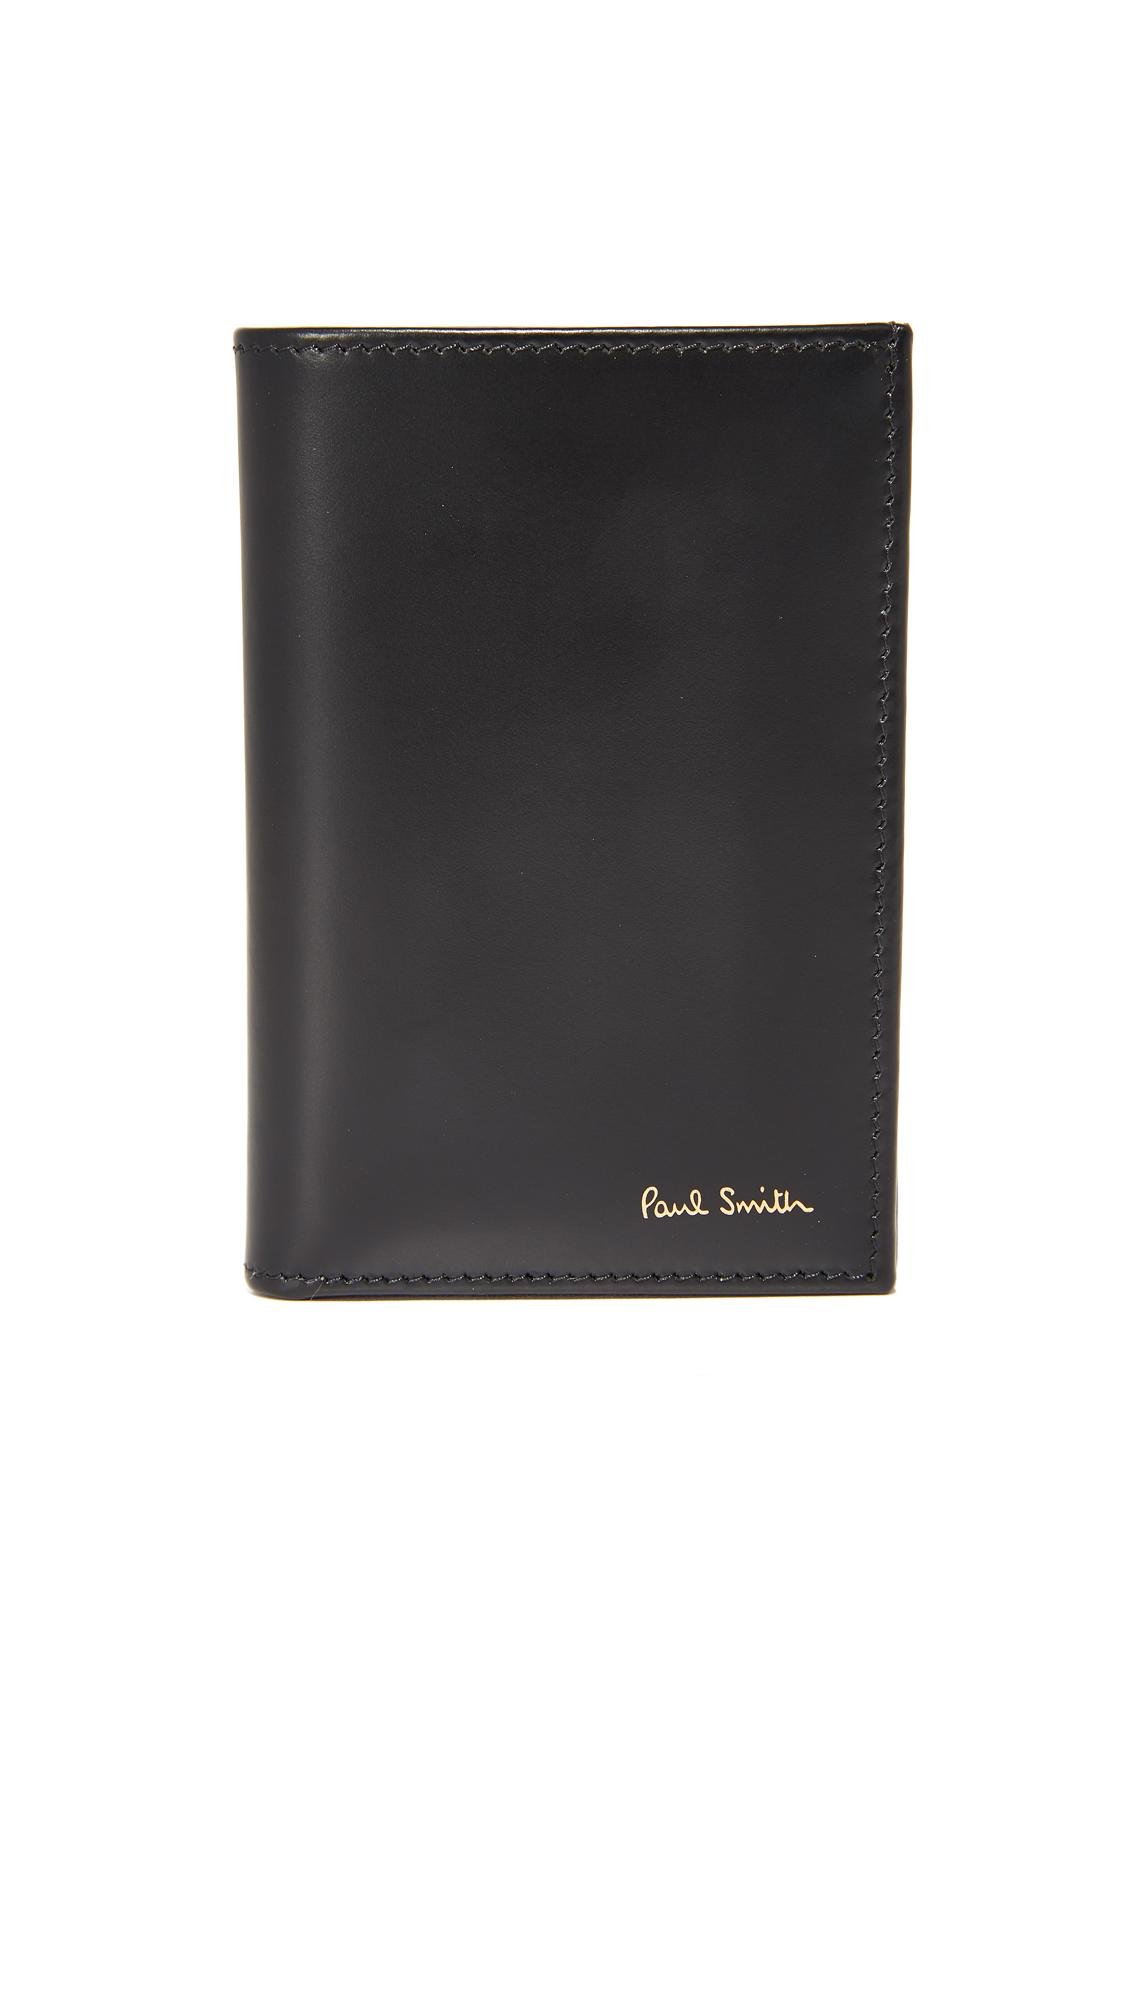 PAUL SMITH Interior Multi Stripe Wallet in Black